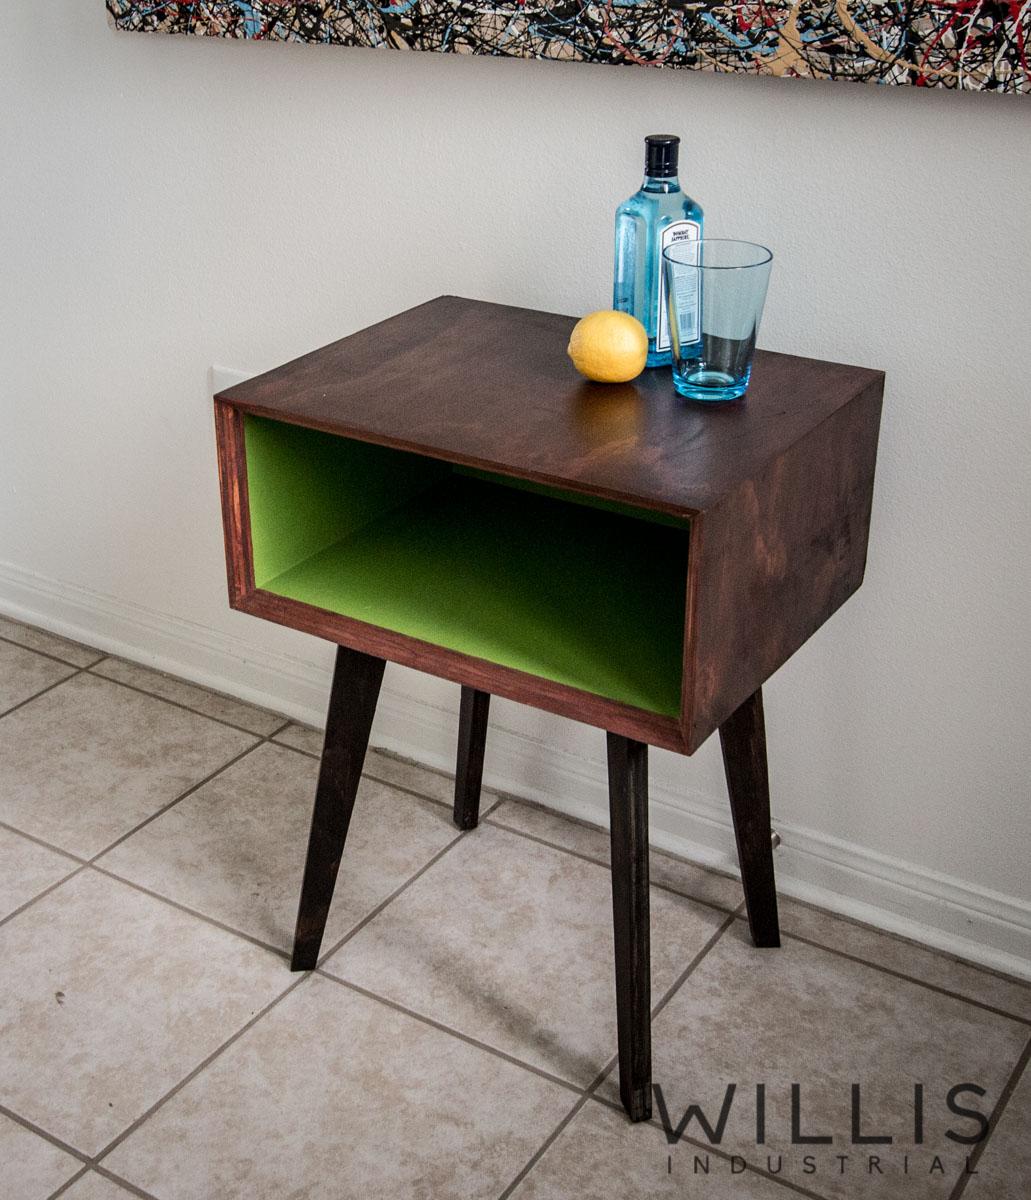 Willis Industrial Furniture   Rustic, Modern Furniture   Mid Century Nightstand